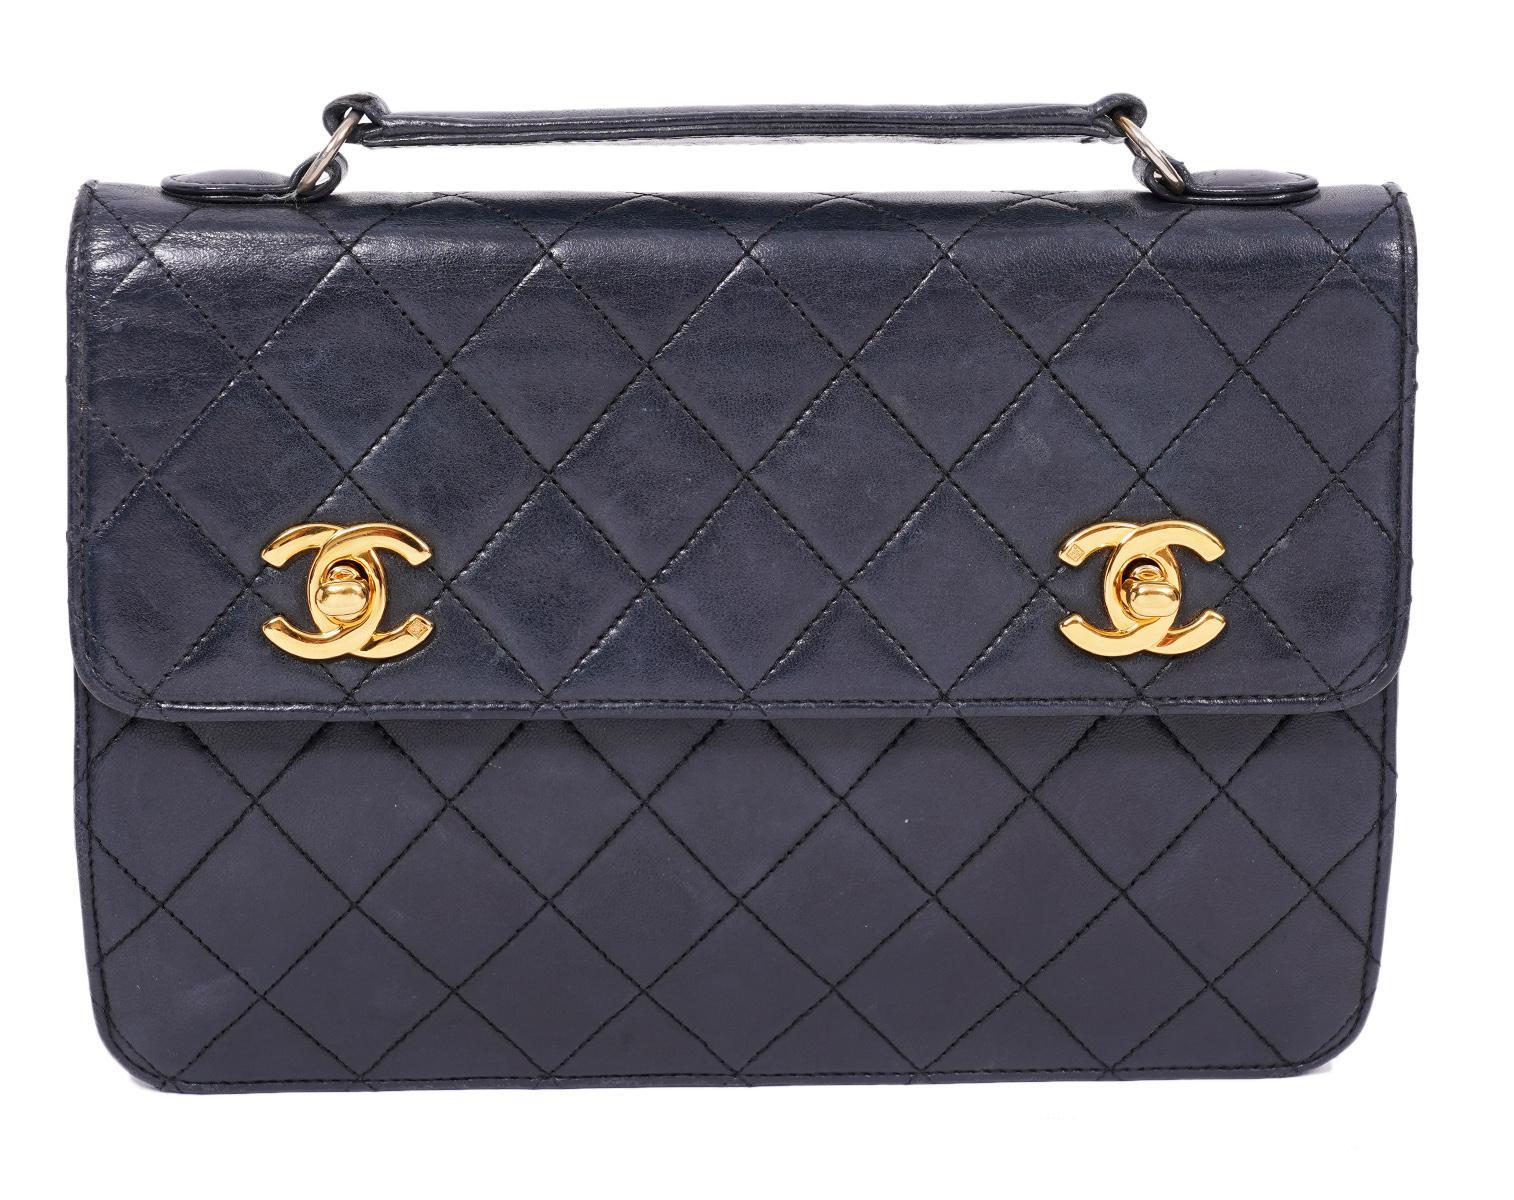 Chanel Vintage Navy Flap Double CC Shoulder Bag